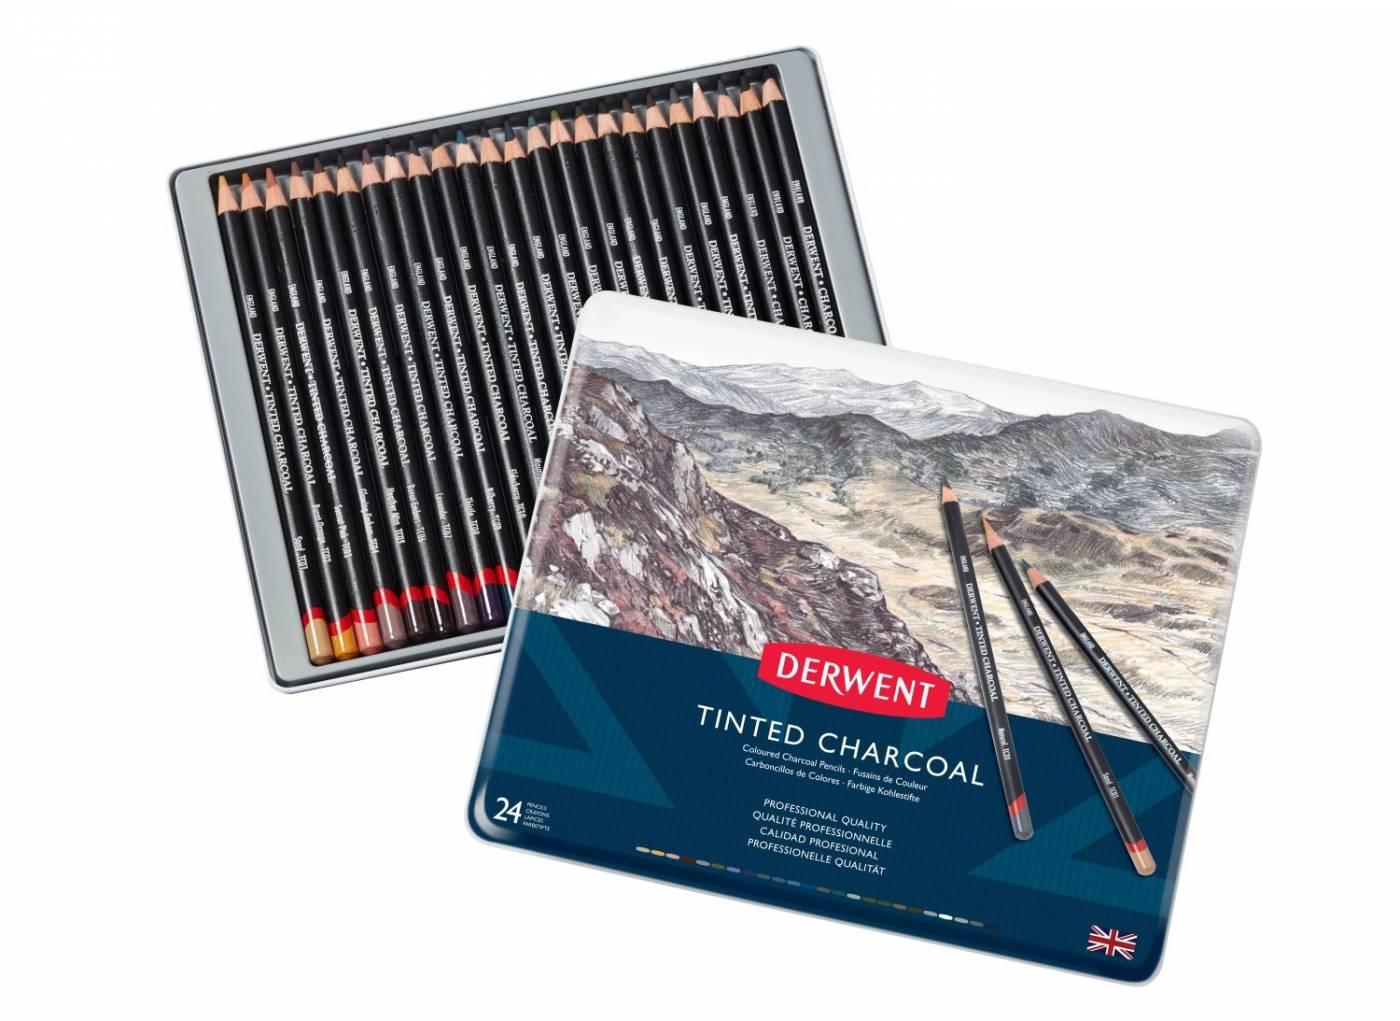 Lápis Carvão Colorido Derwent 24 Cores - Tinted Charcoal